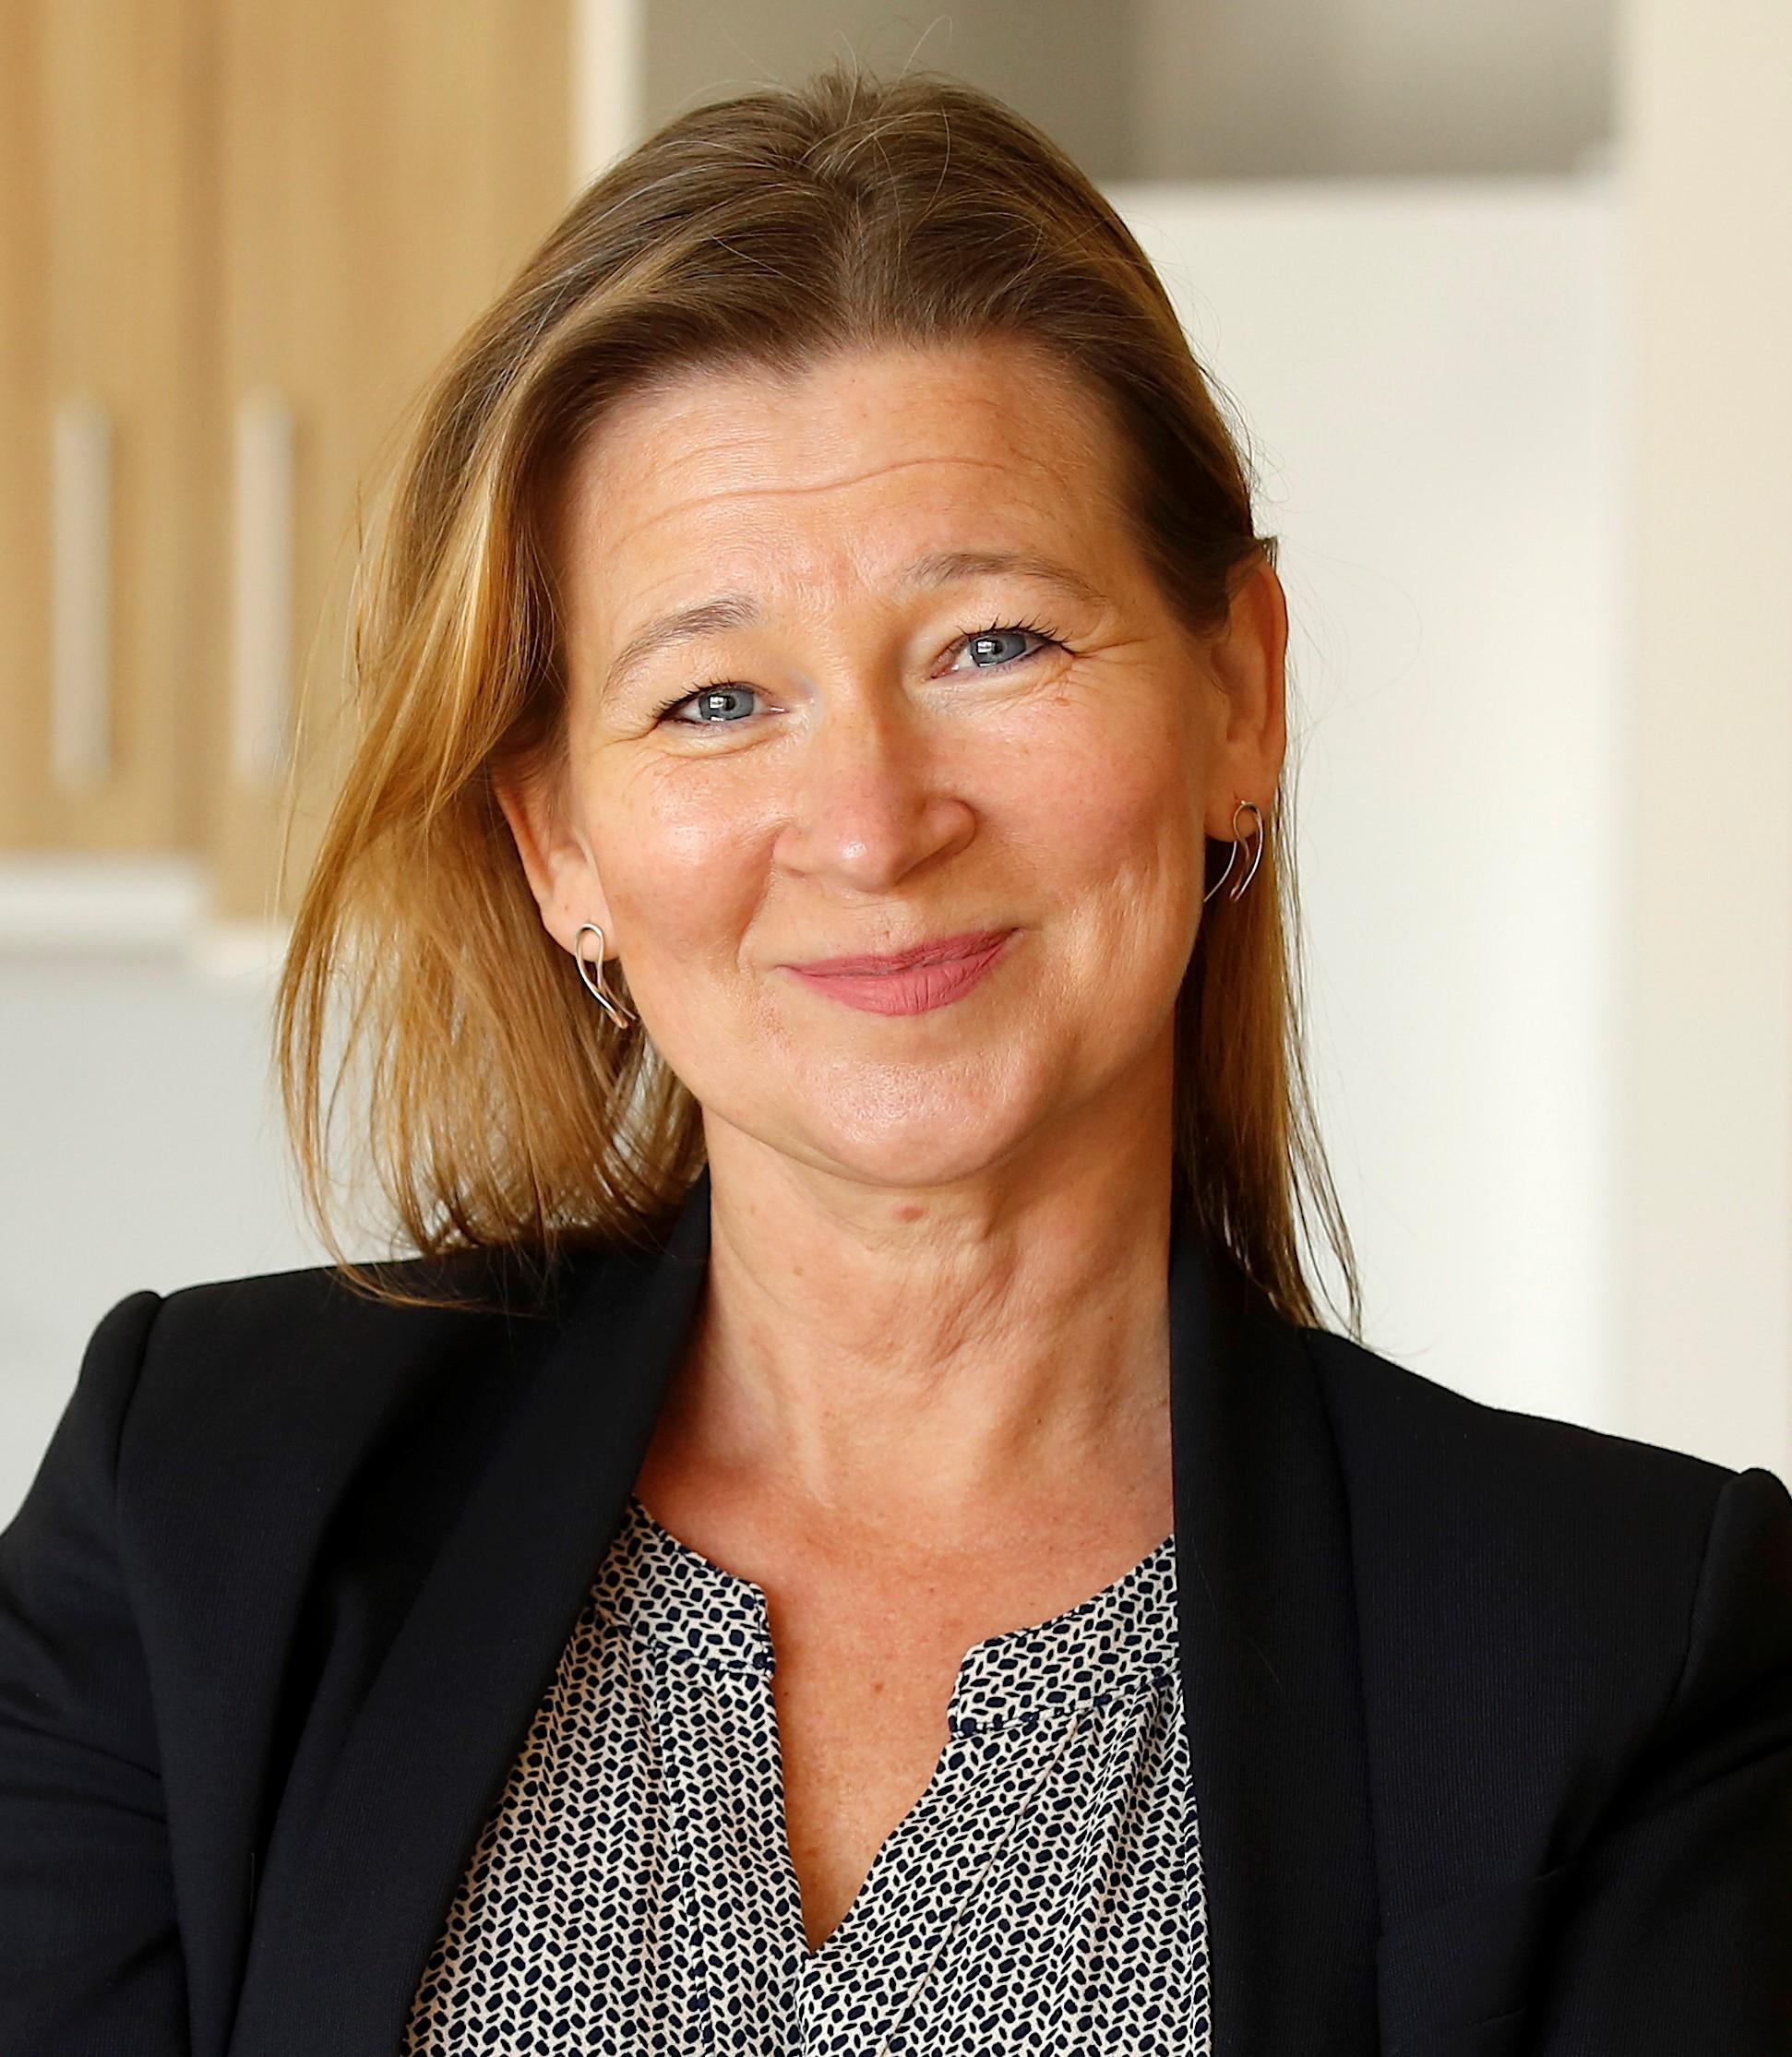 Anki Lindfors profile picture